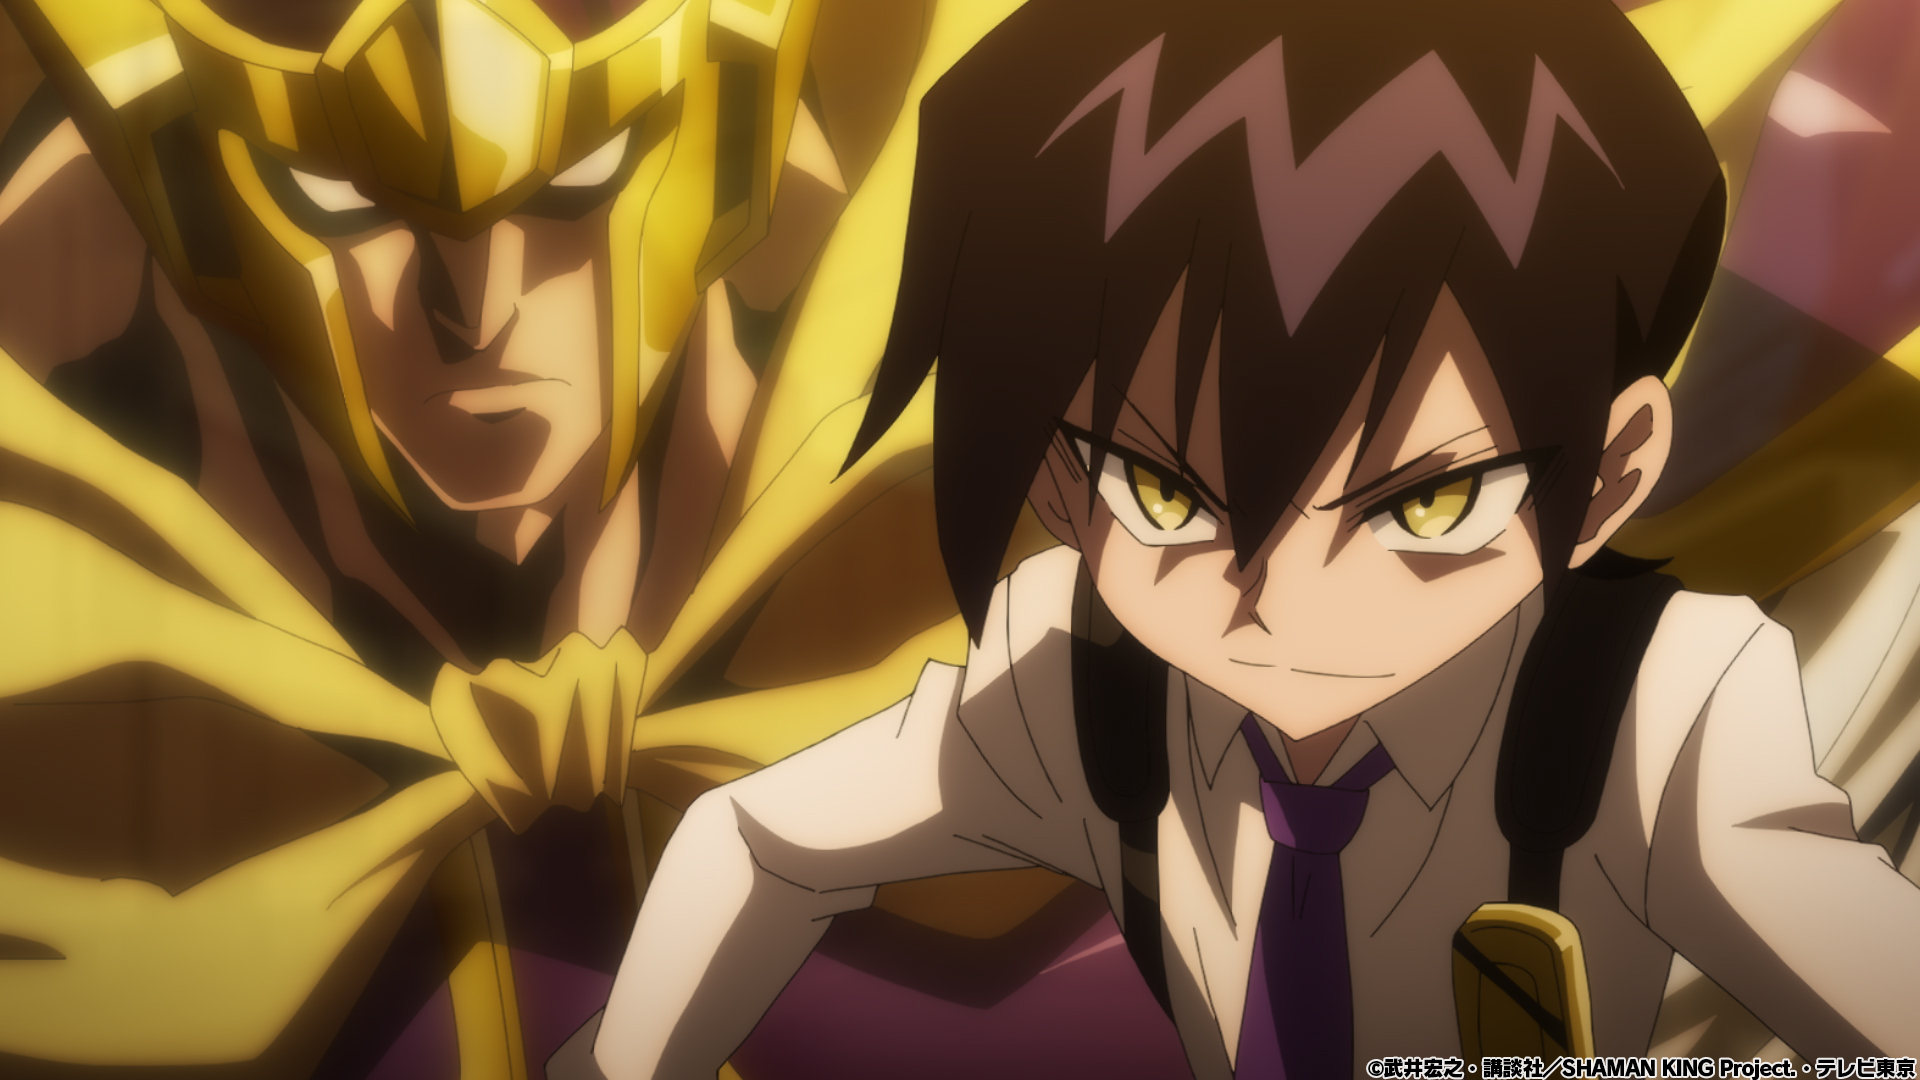 TVアニメ「SHAMAN KING」第2廻 「もう一人のシャーマン」先行カット